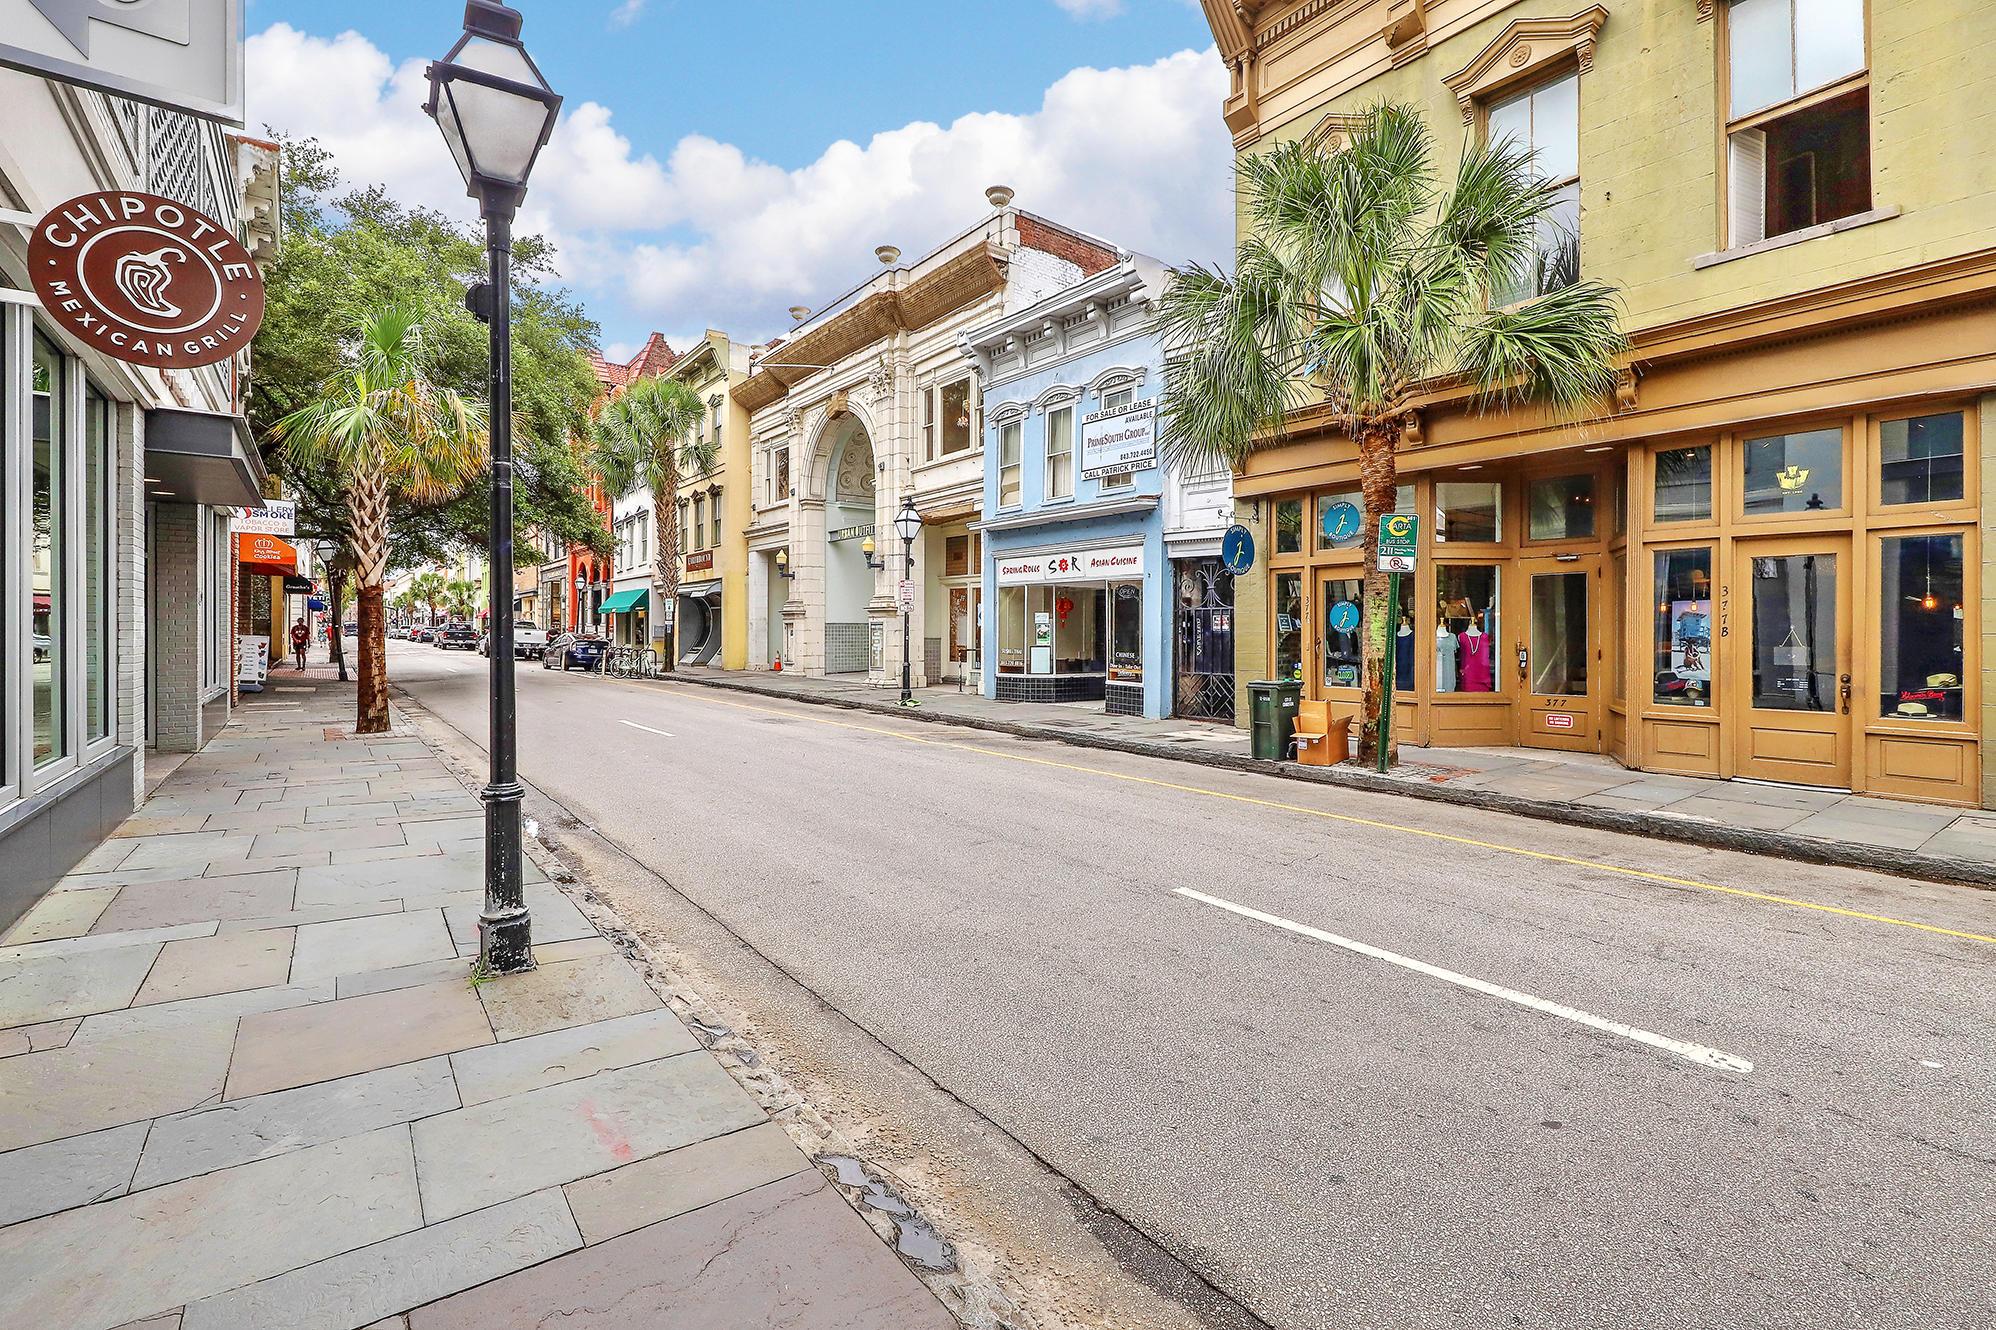 King Street Lofts Homes For Sale - 350 King, Charleston, SC - 12